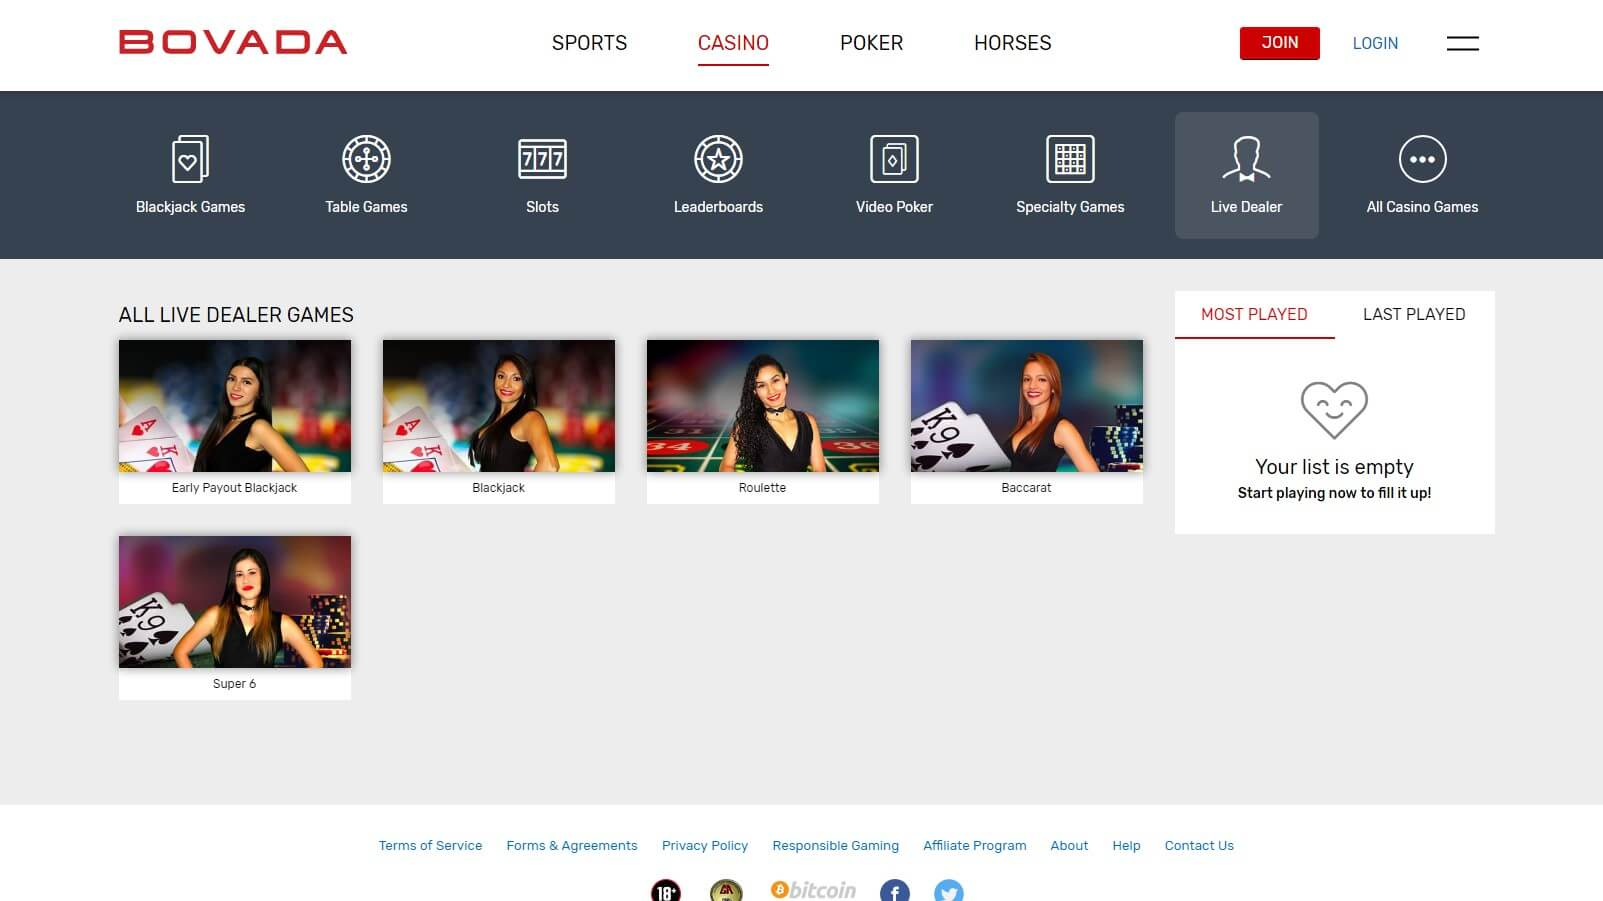 Bovada Casino Review | New Welcome Bonus and Live Dealer Games